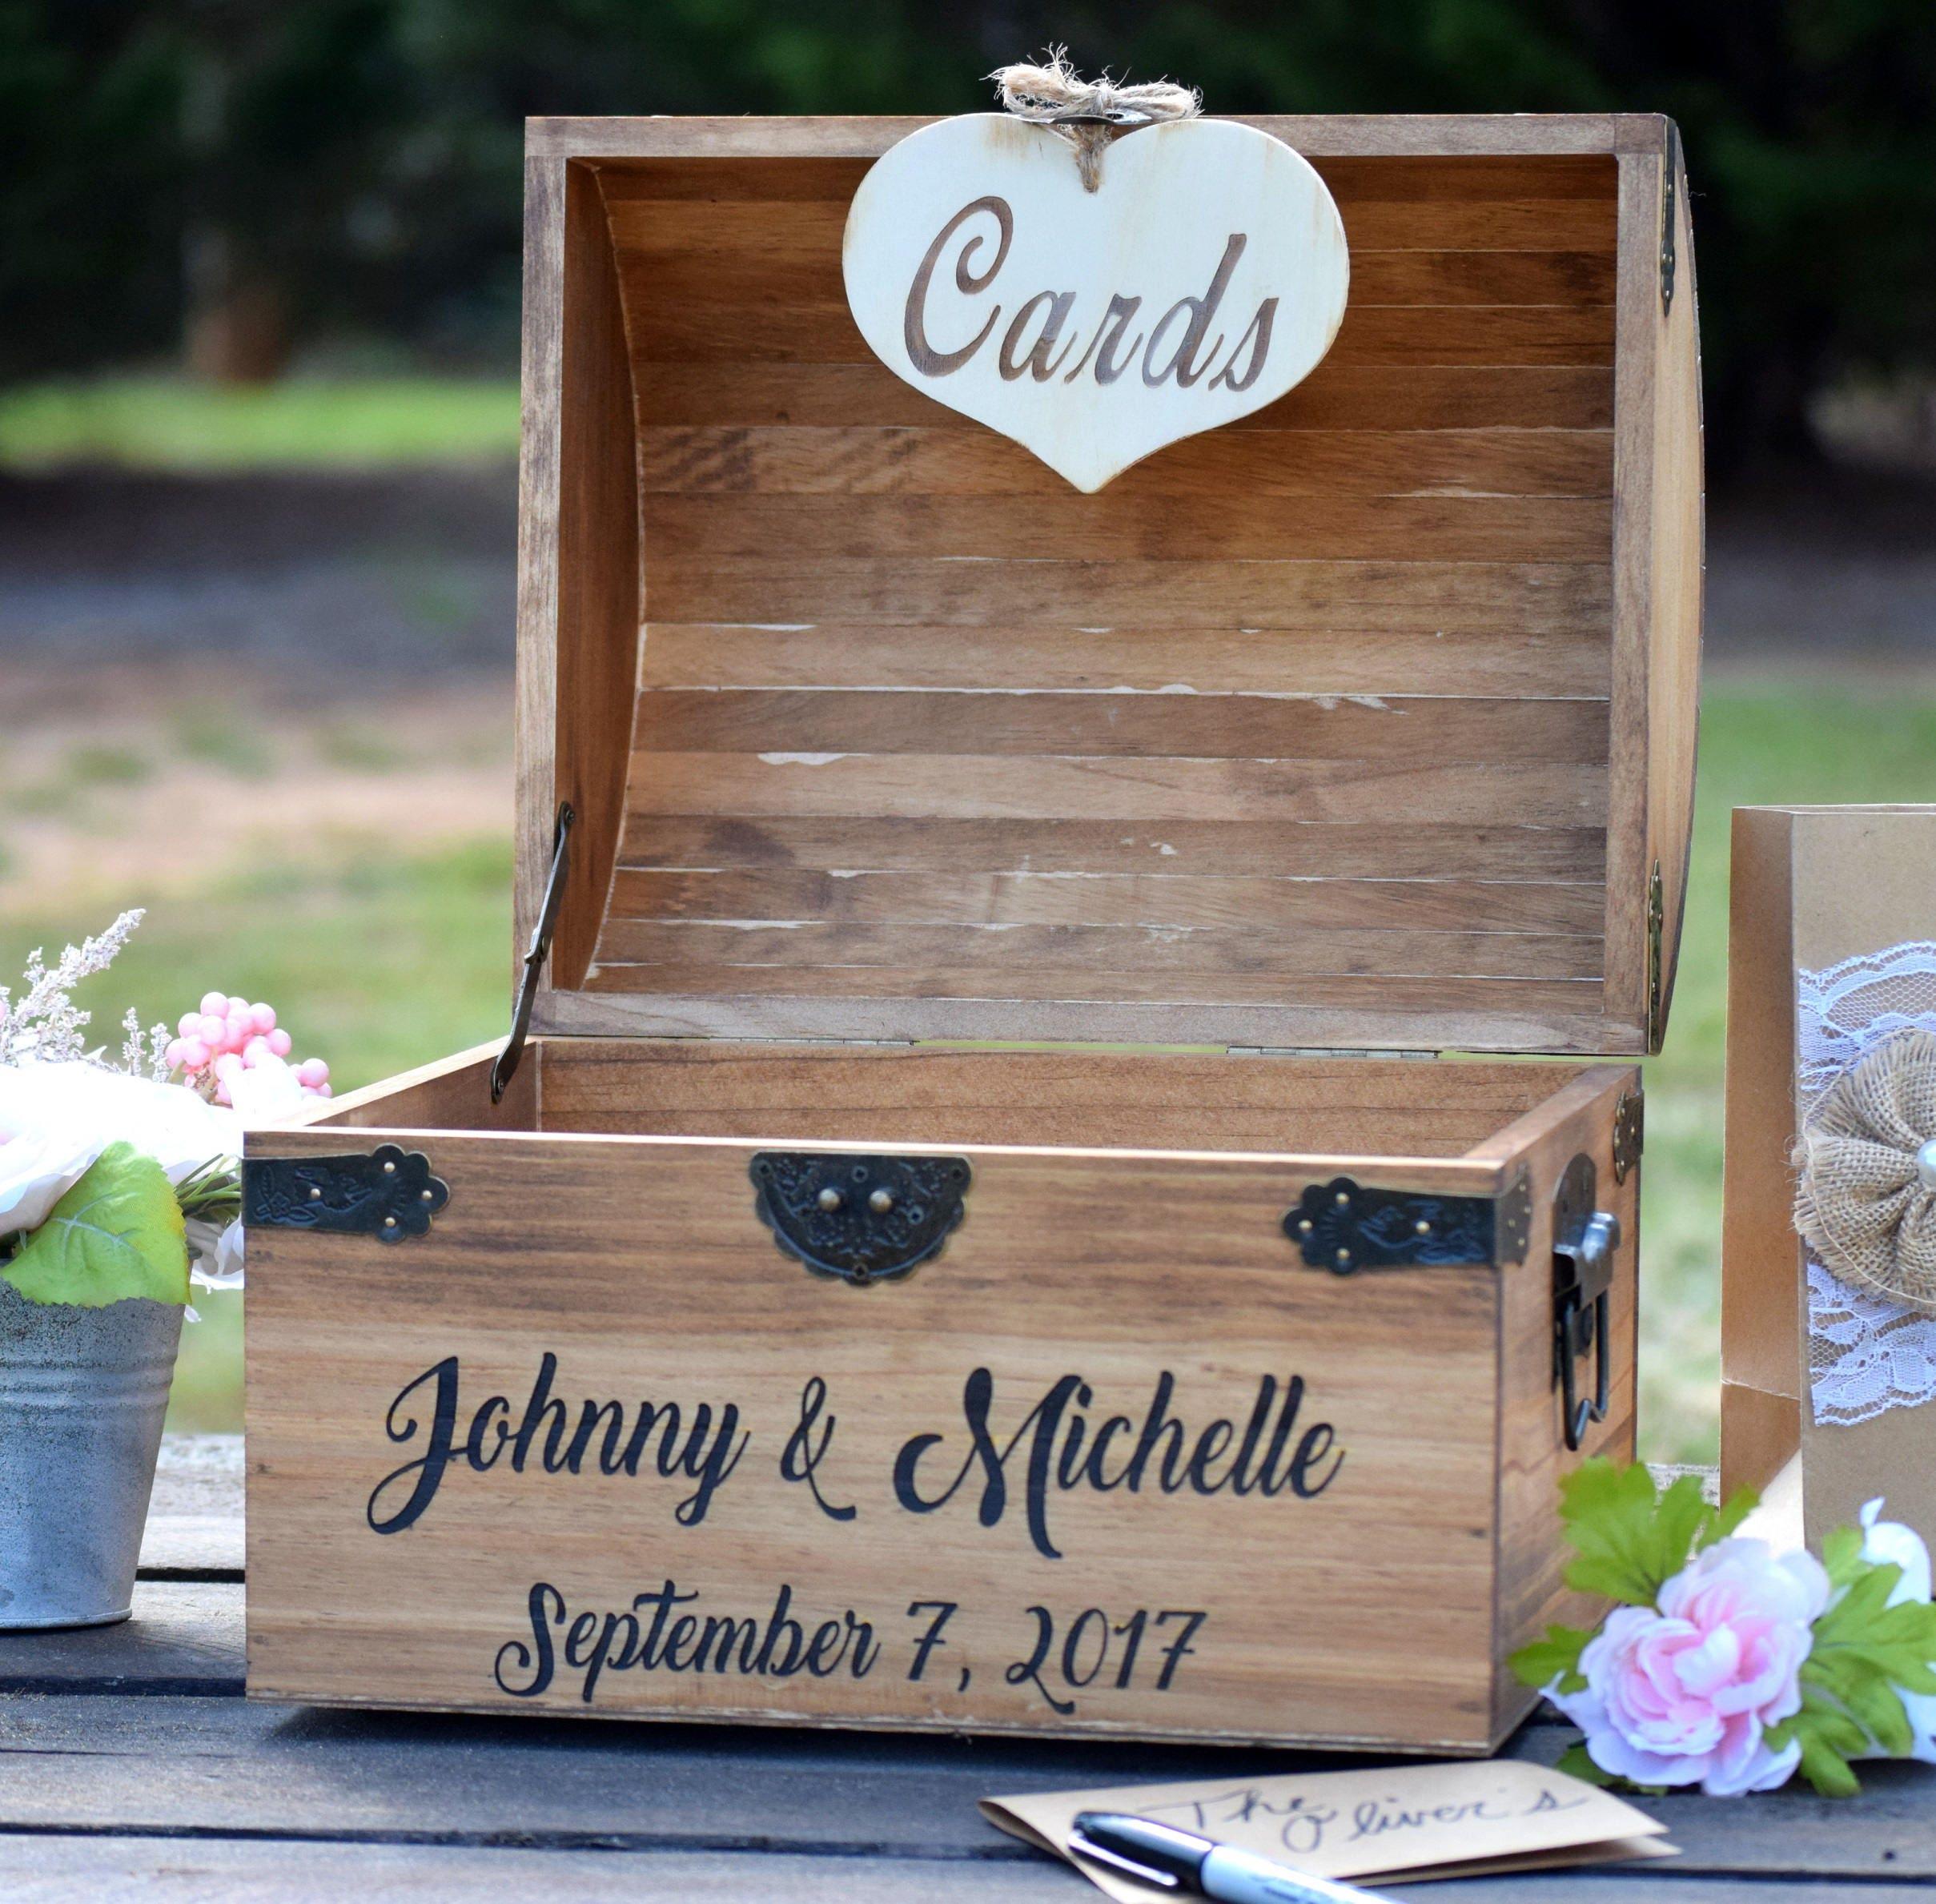 Shabby Chic Wedding Wooden Card Box Rustic Wedding Card |Wooden Chest For Wedding Cards